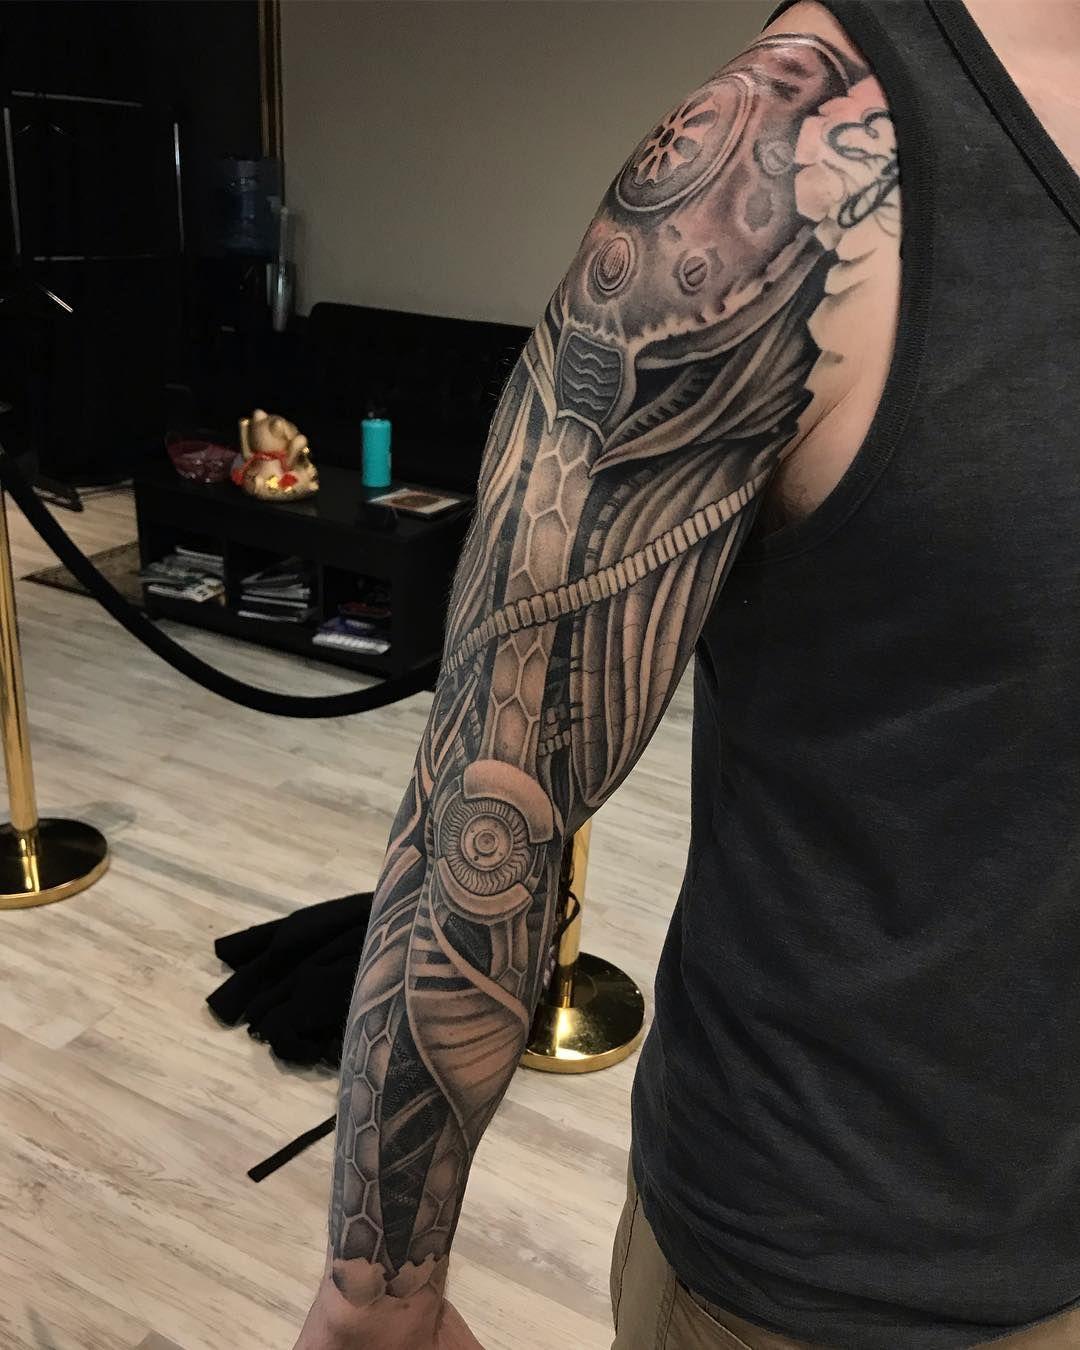 101 Amazing Robot Arm Tattoo Ideas That Will Blow Your Mind In 2020 Tattoos Tribal Arm Tattoos Tattoo Machine Design